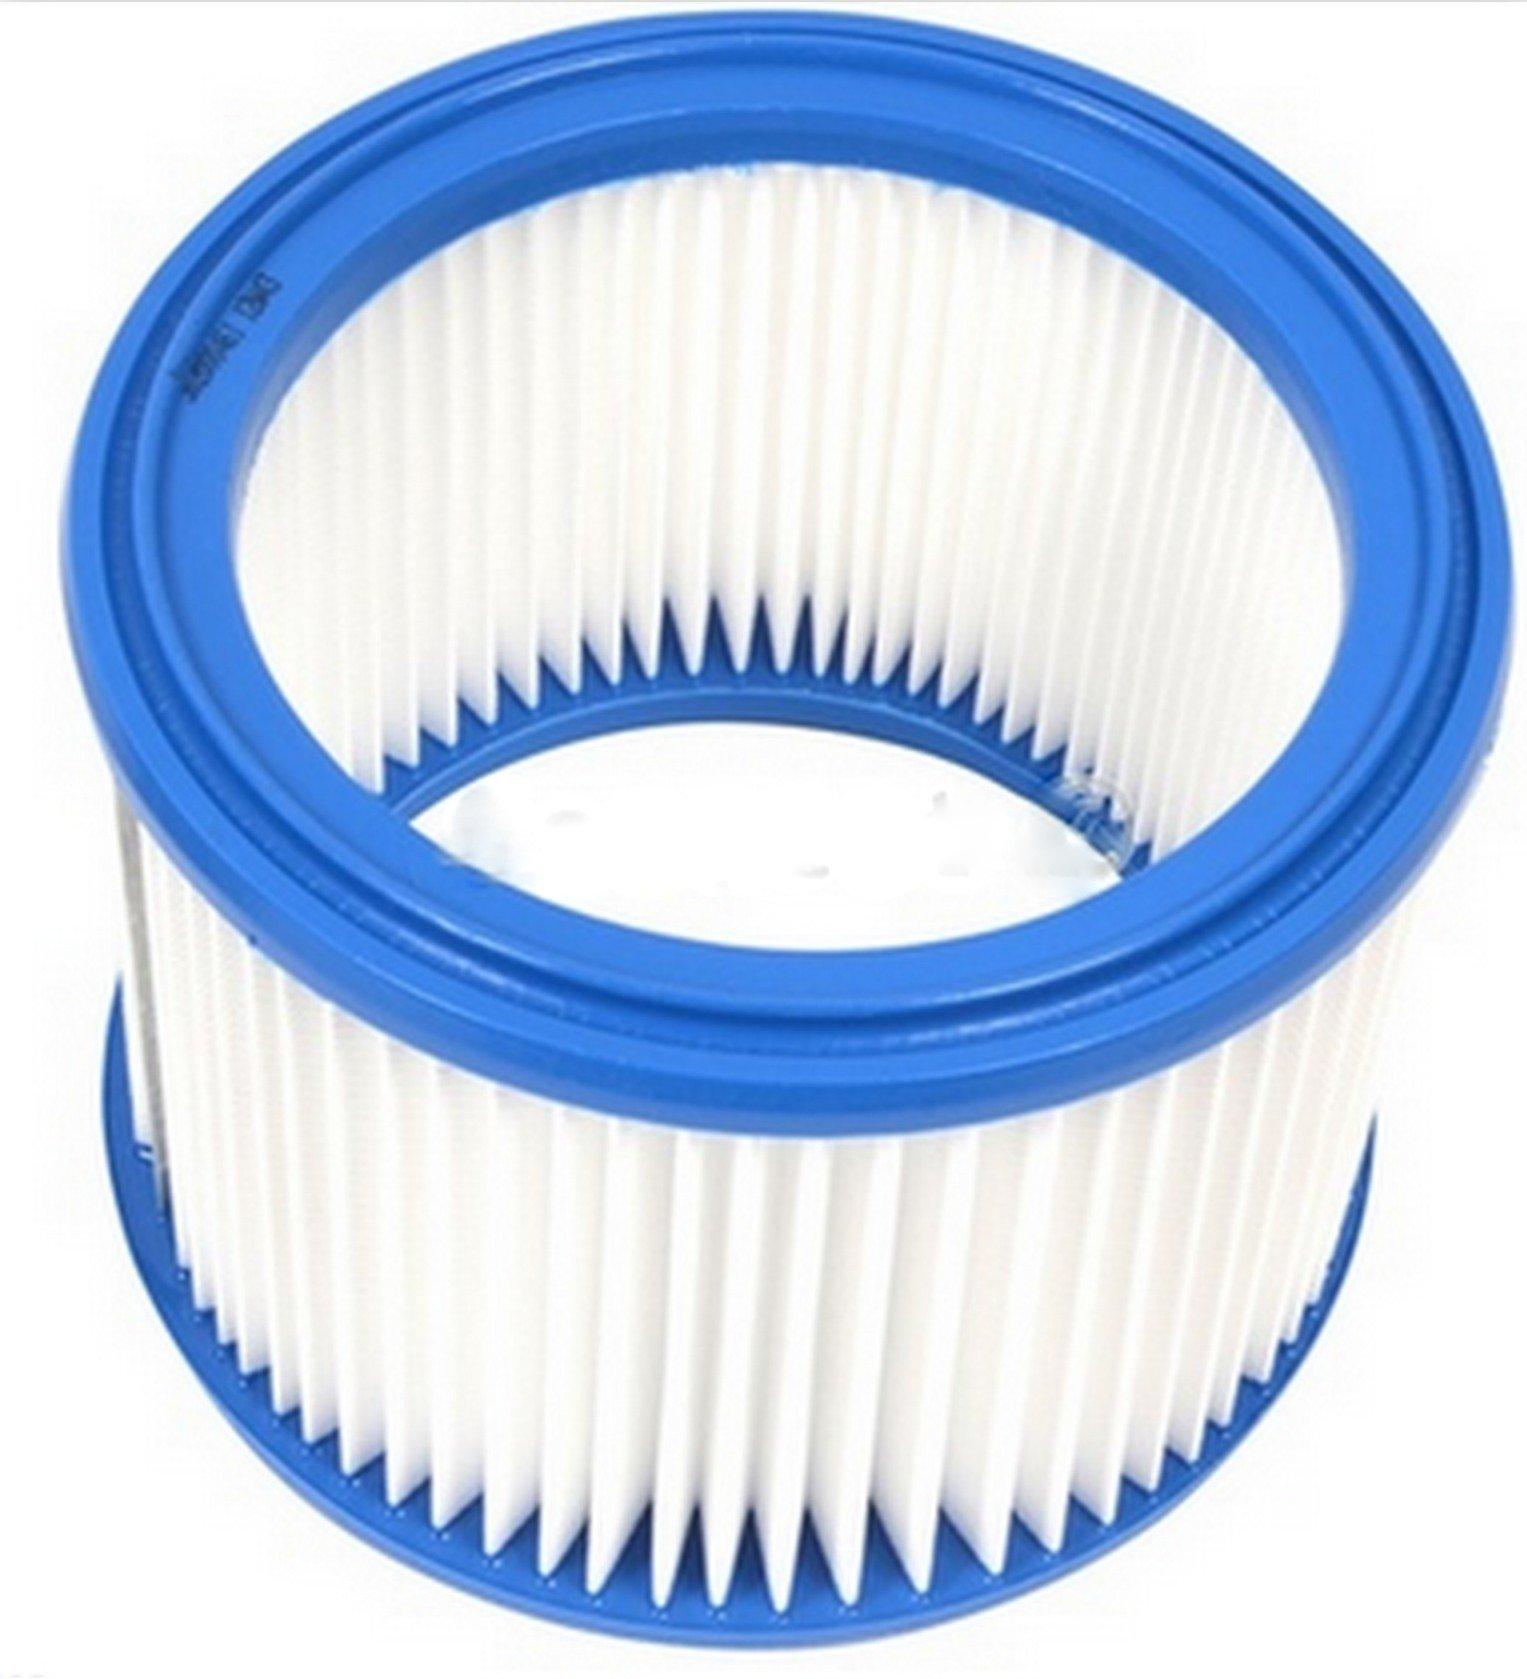 bartyspares® Filtro Hepa Lavable para aspiradoras Stihl Hoover SE-61, SE-121, SE-122: Amazon.es: Hogar